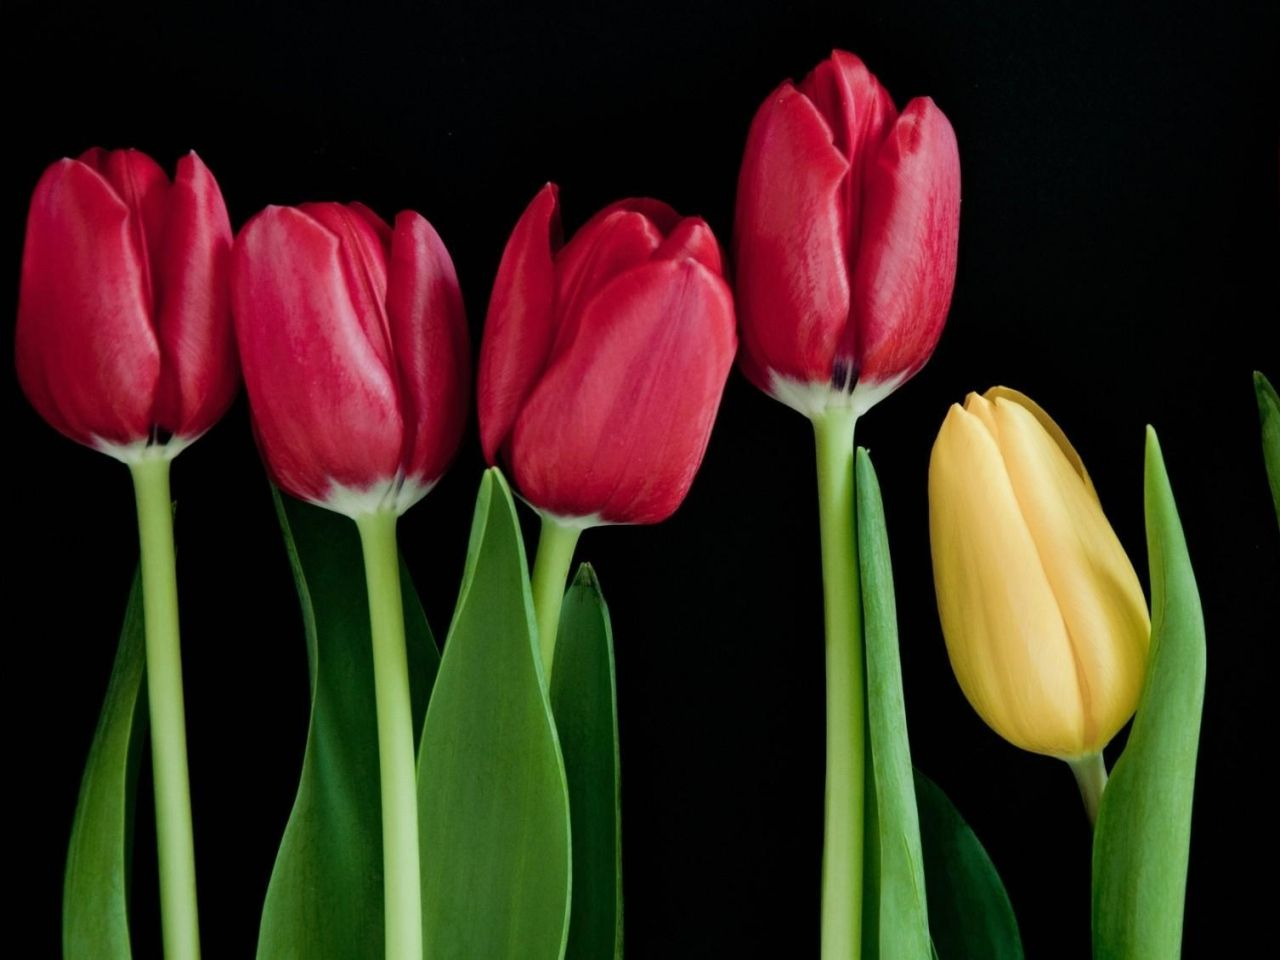 Bunga Gambar Wallpaper Tulip Batang Vektor Hitam Foto Latar Belakang Latar Belakang Tunas